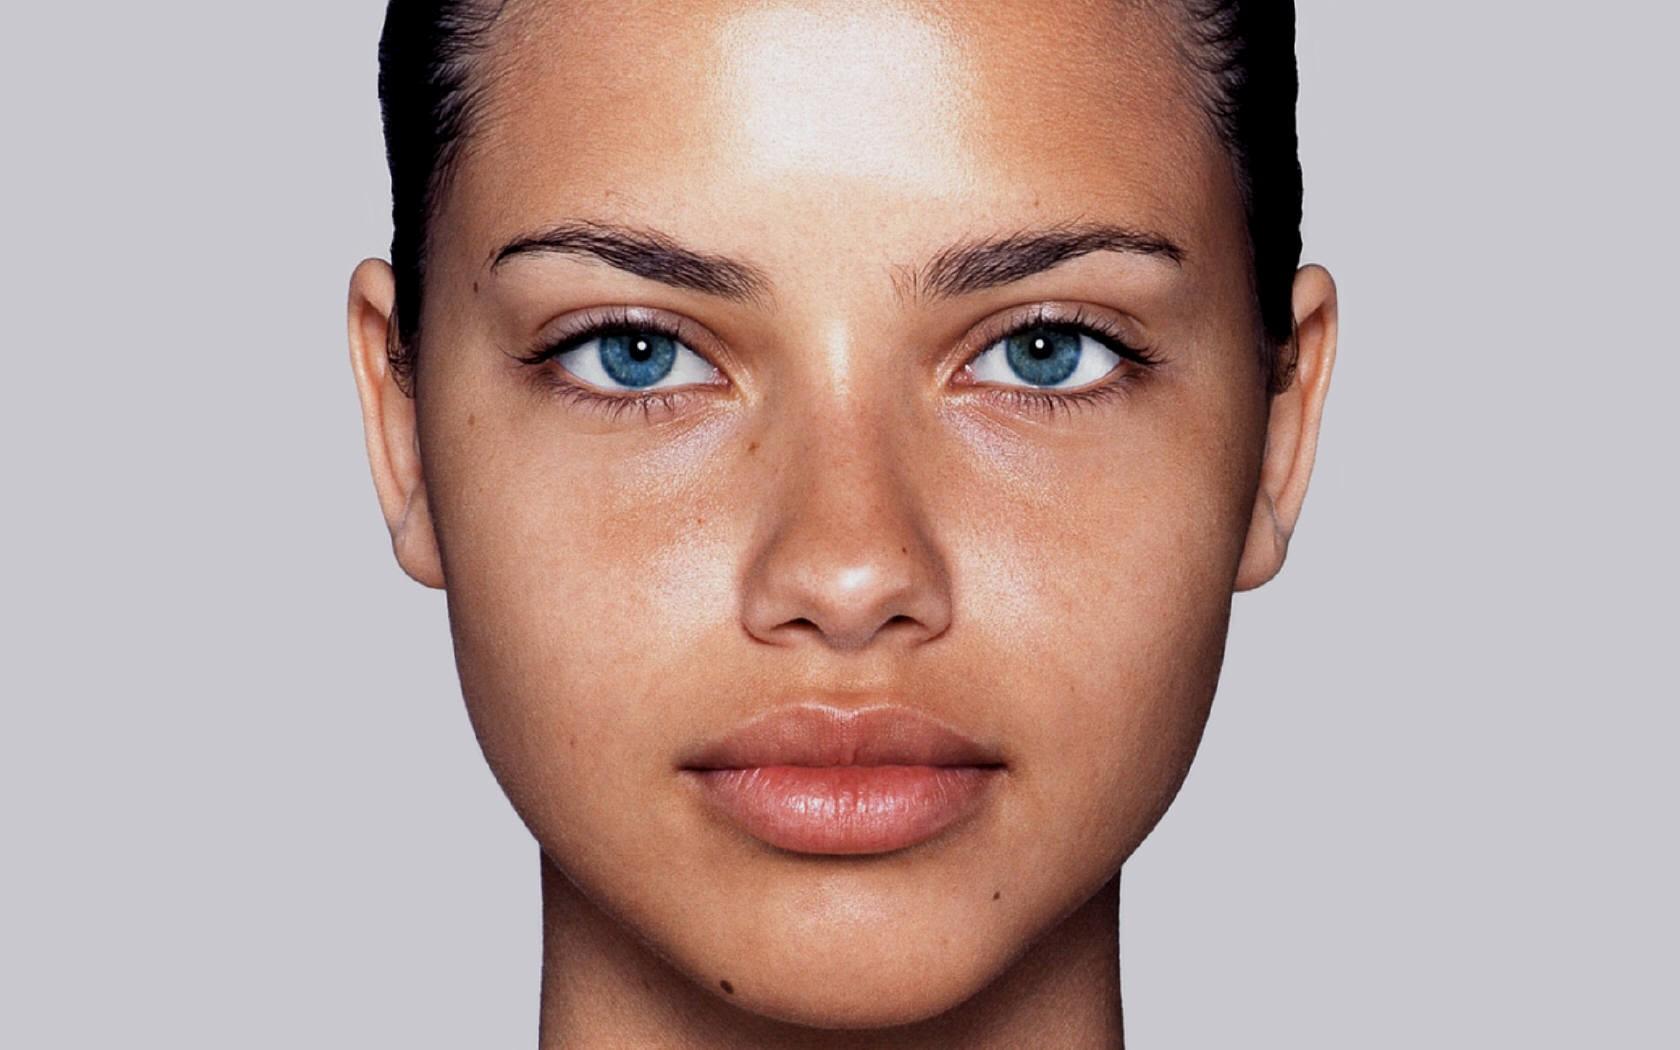 Фото людей лица девушки